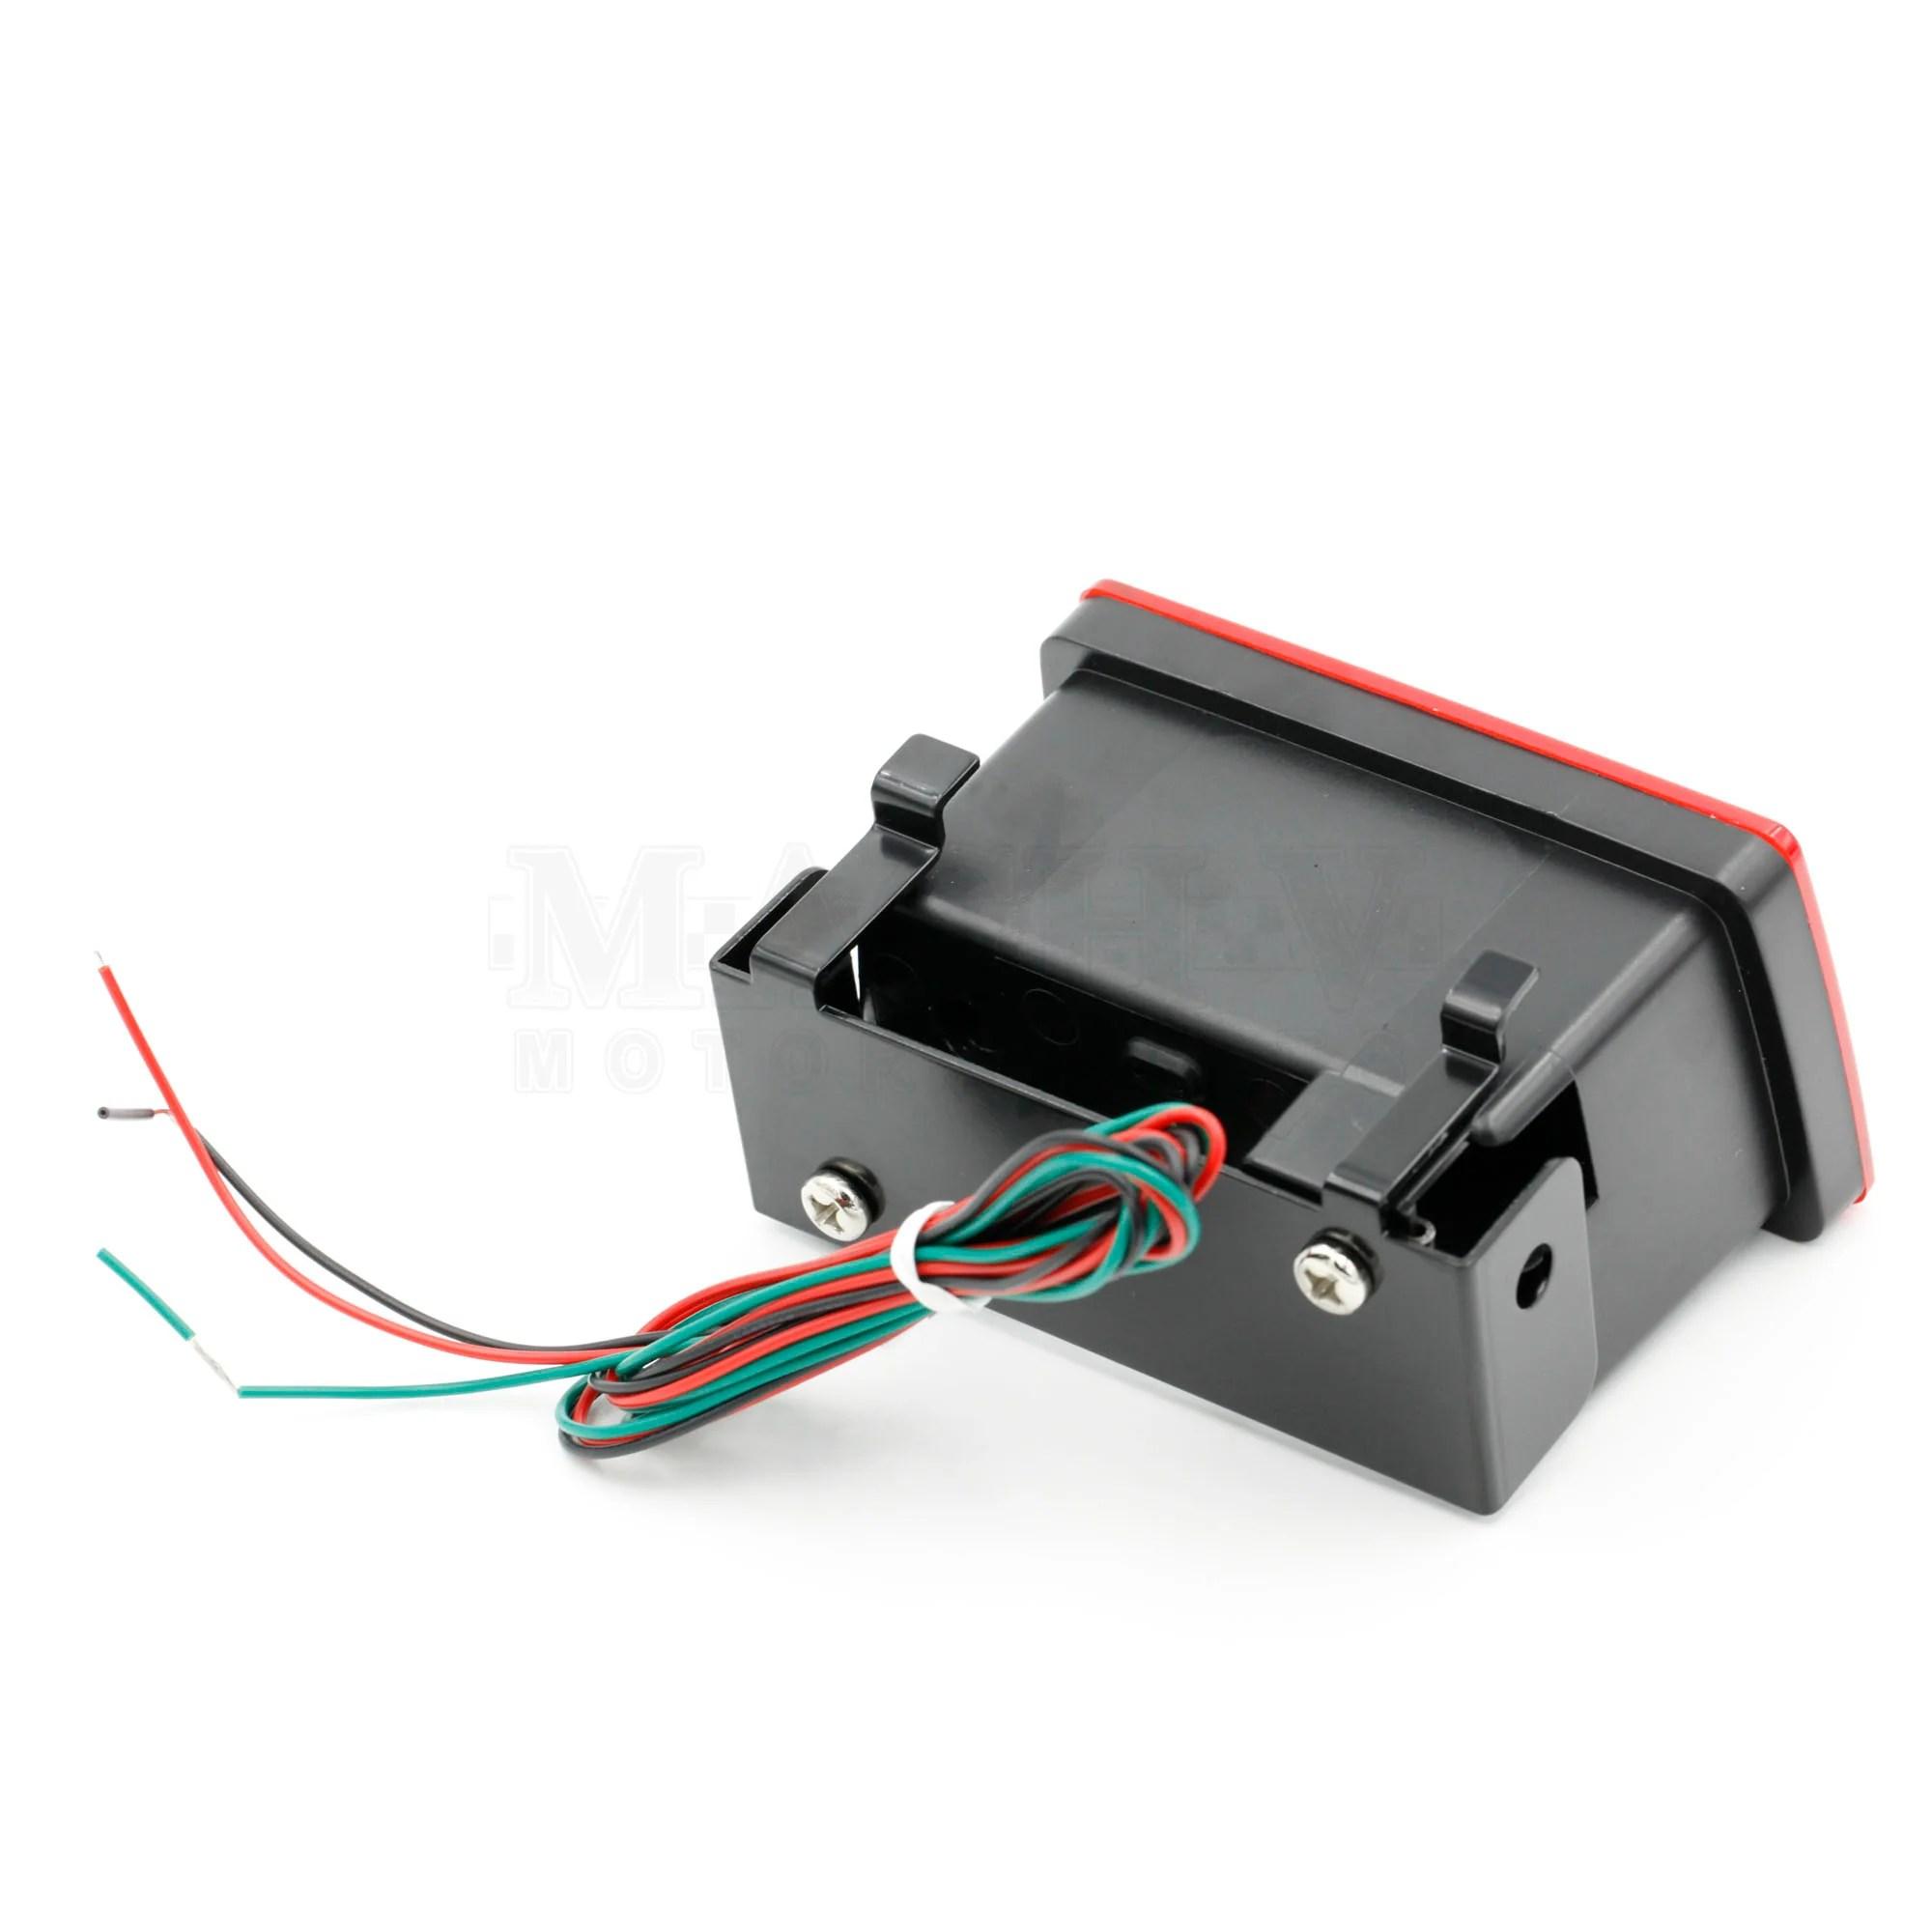 f1 style rear brake lamp 2011 subaru wrx sti [ 2000 x 2000 Pixel ]